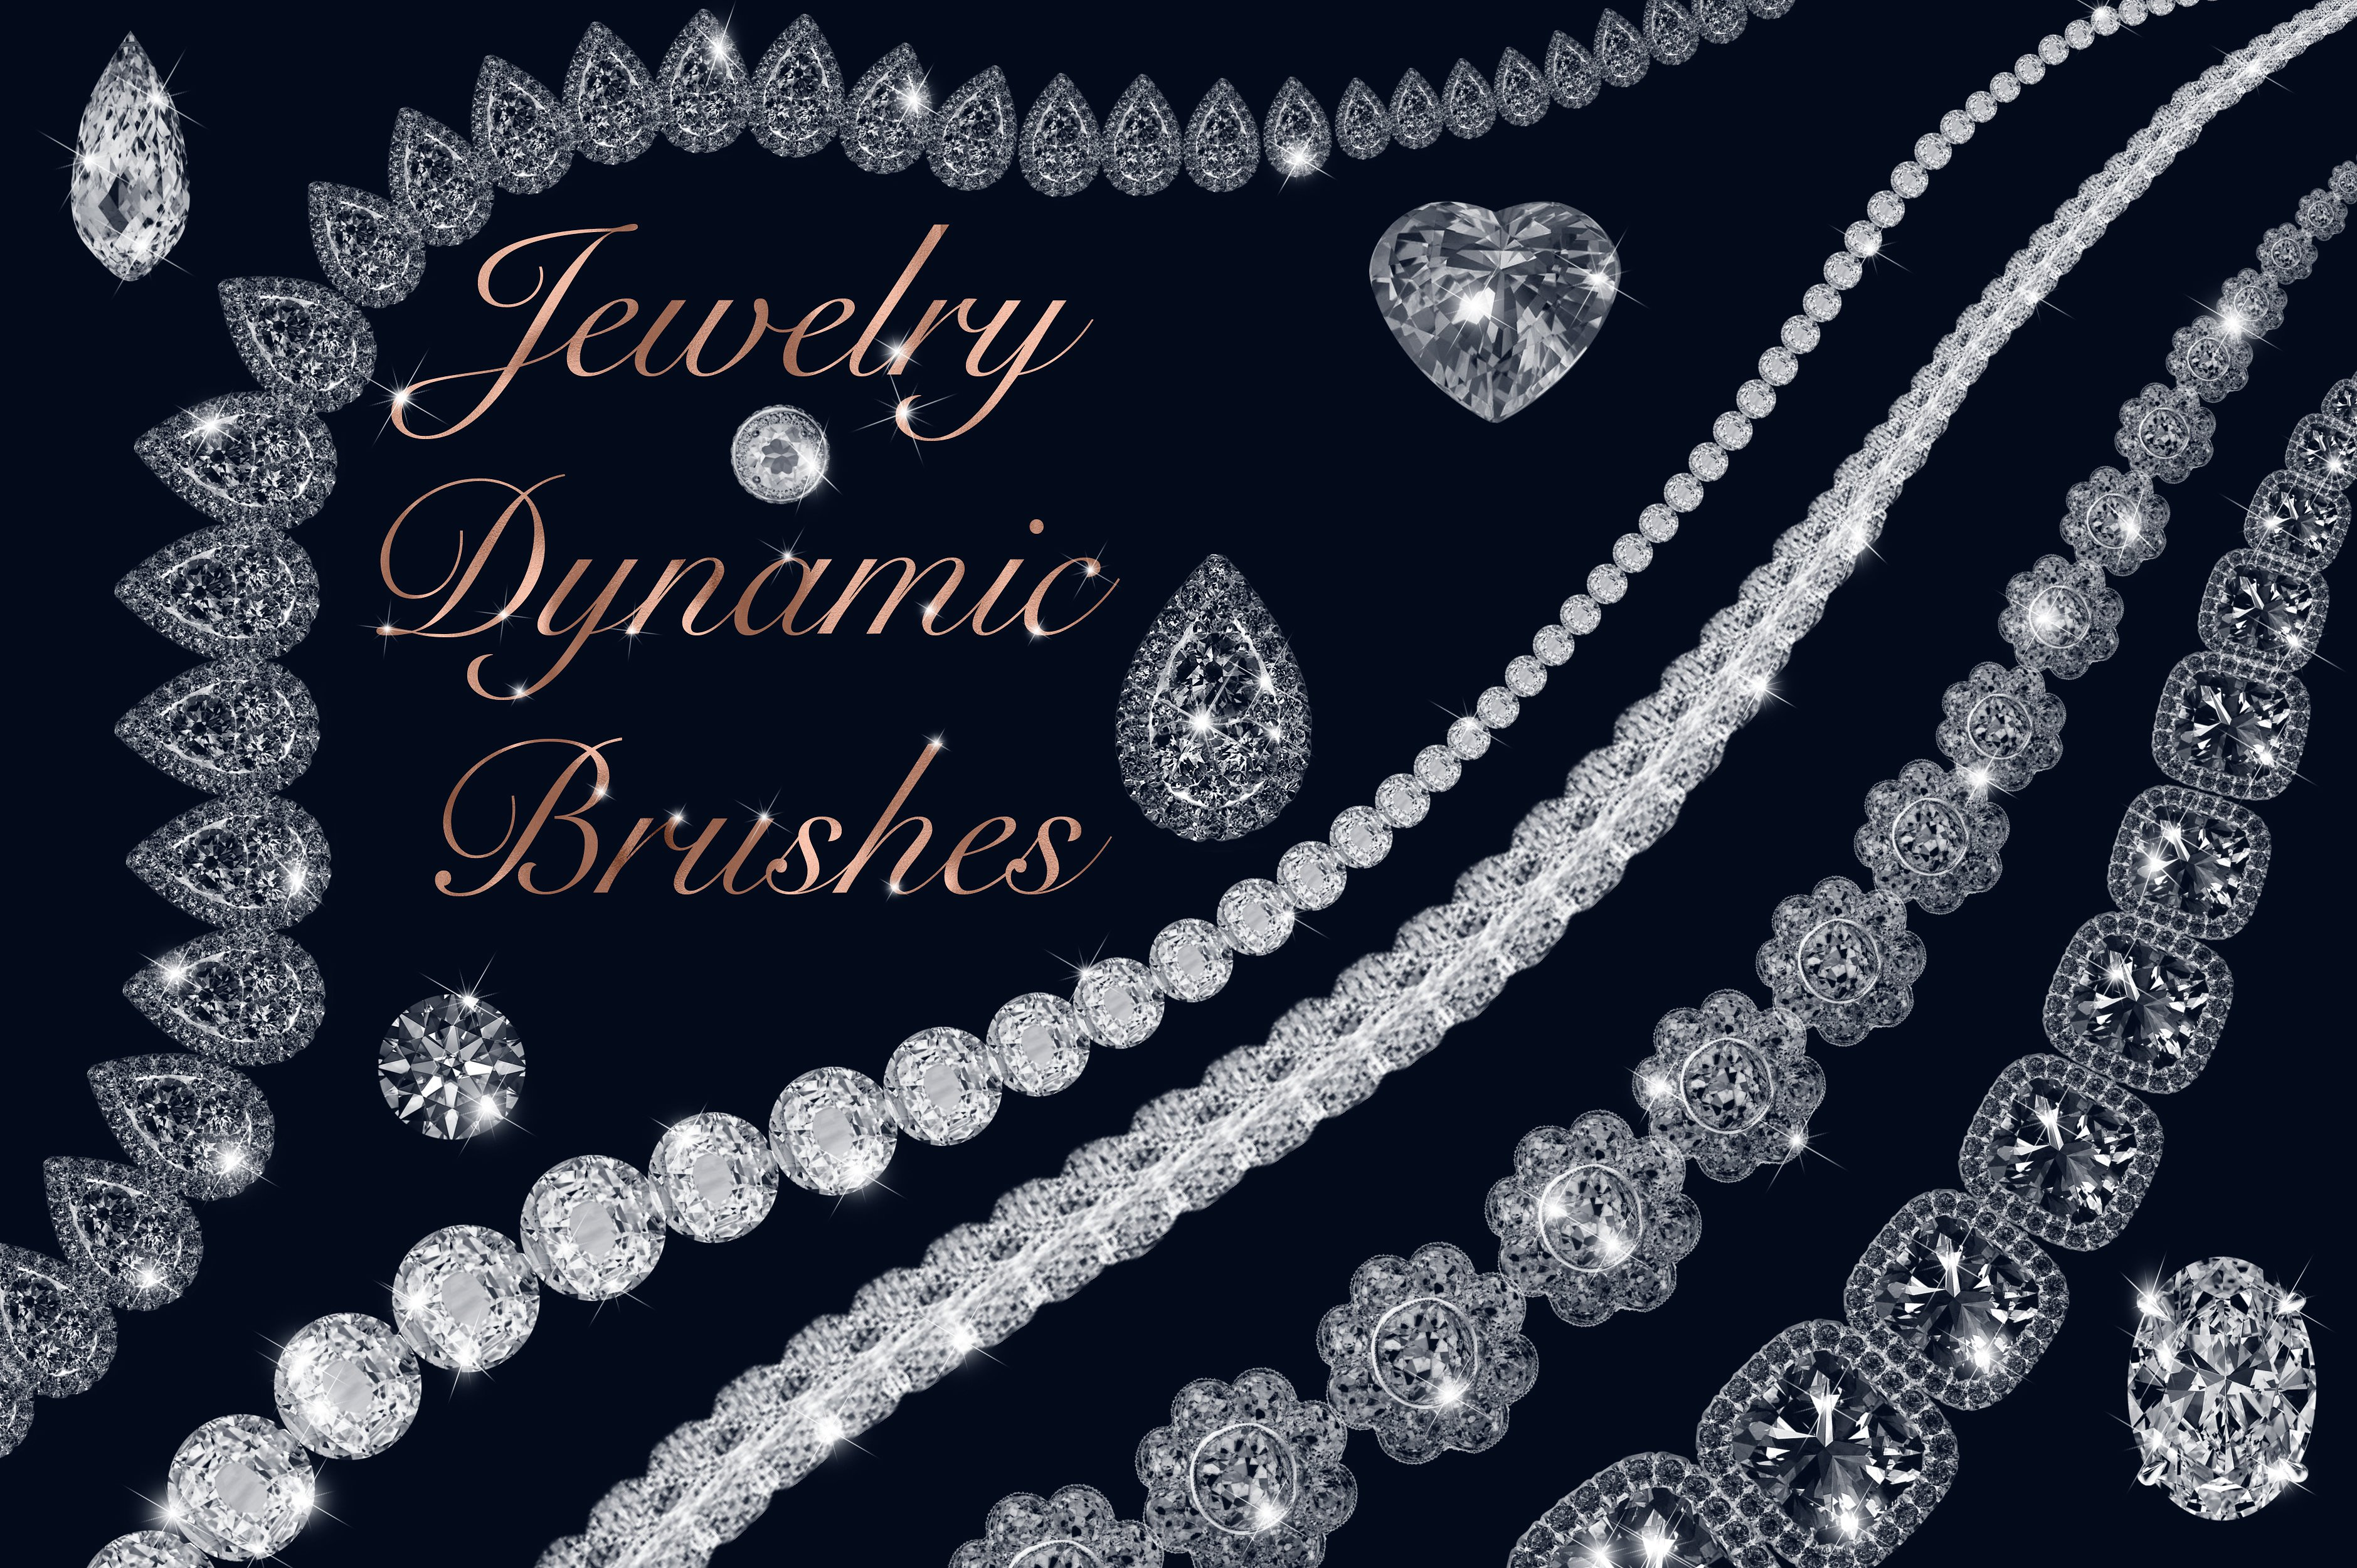 Jewelry Dynamic Brushes example image 1